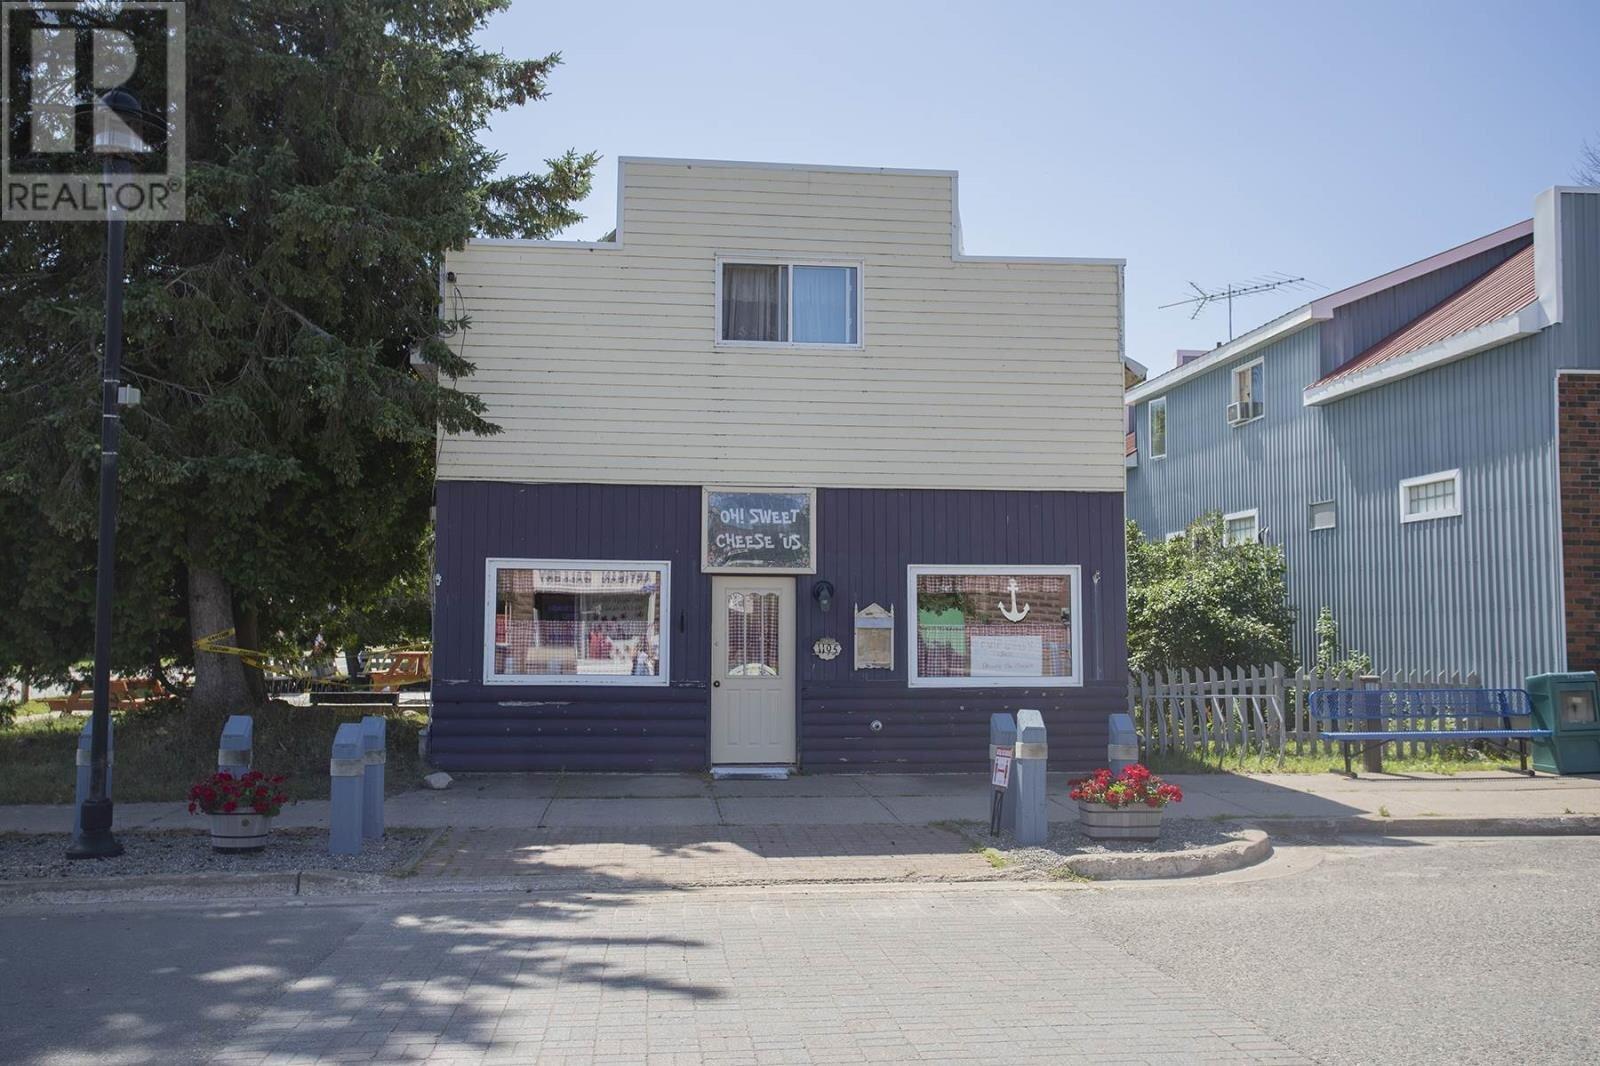 Residential property for sale at 1195 Richard St Richards Landing Ontario - MLS: SM129273